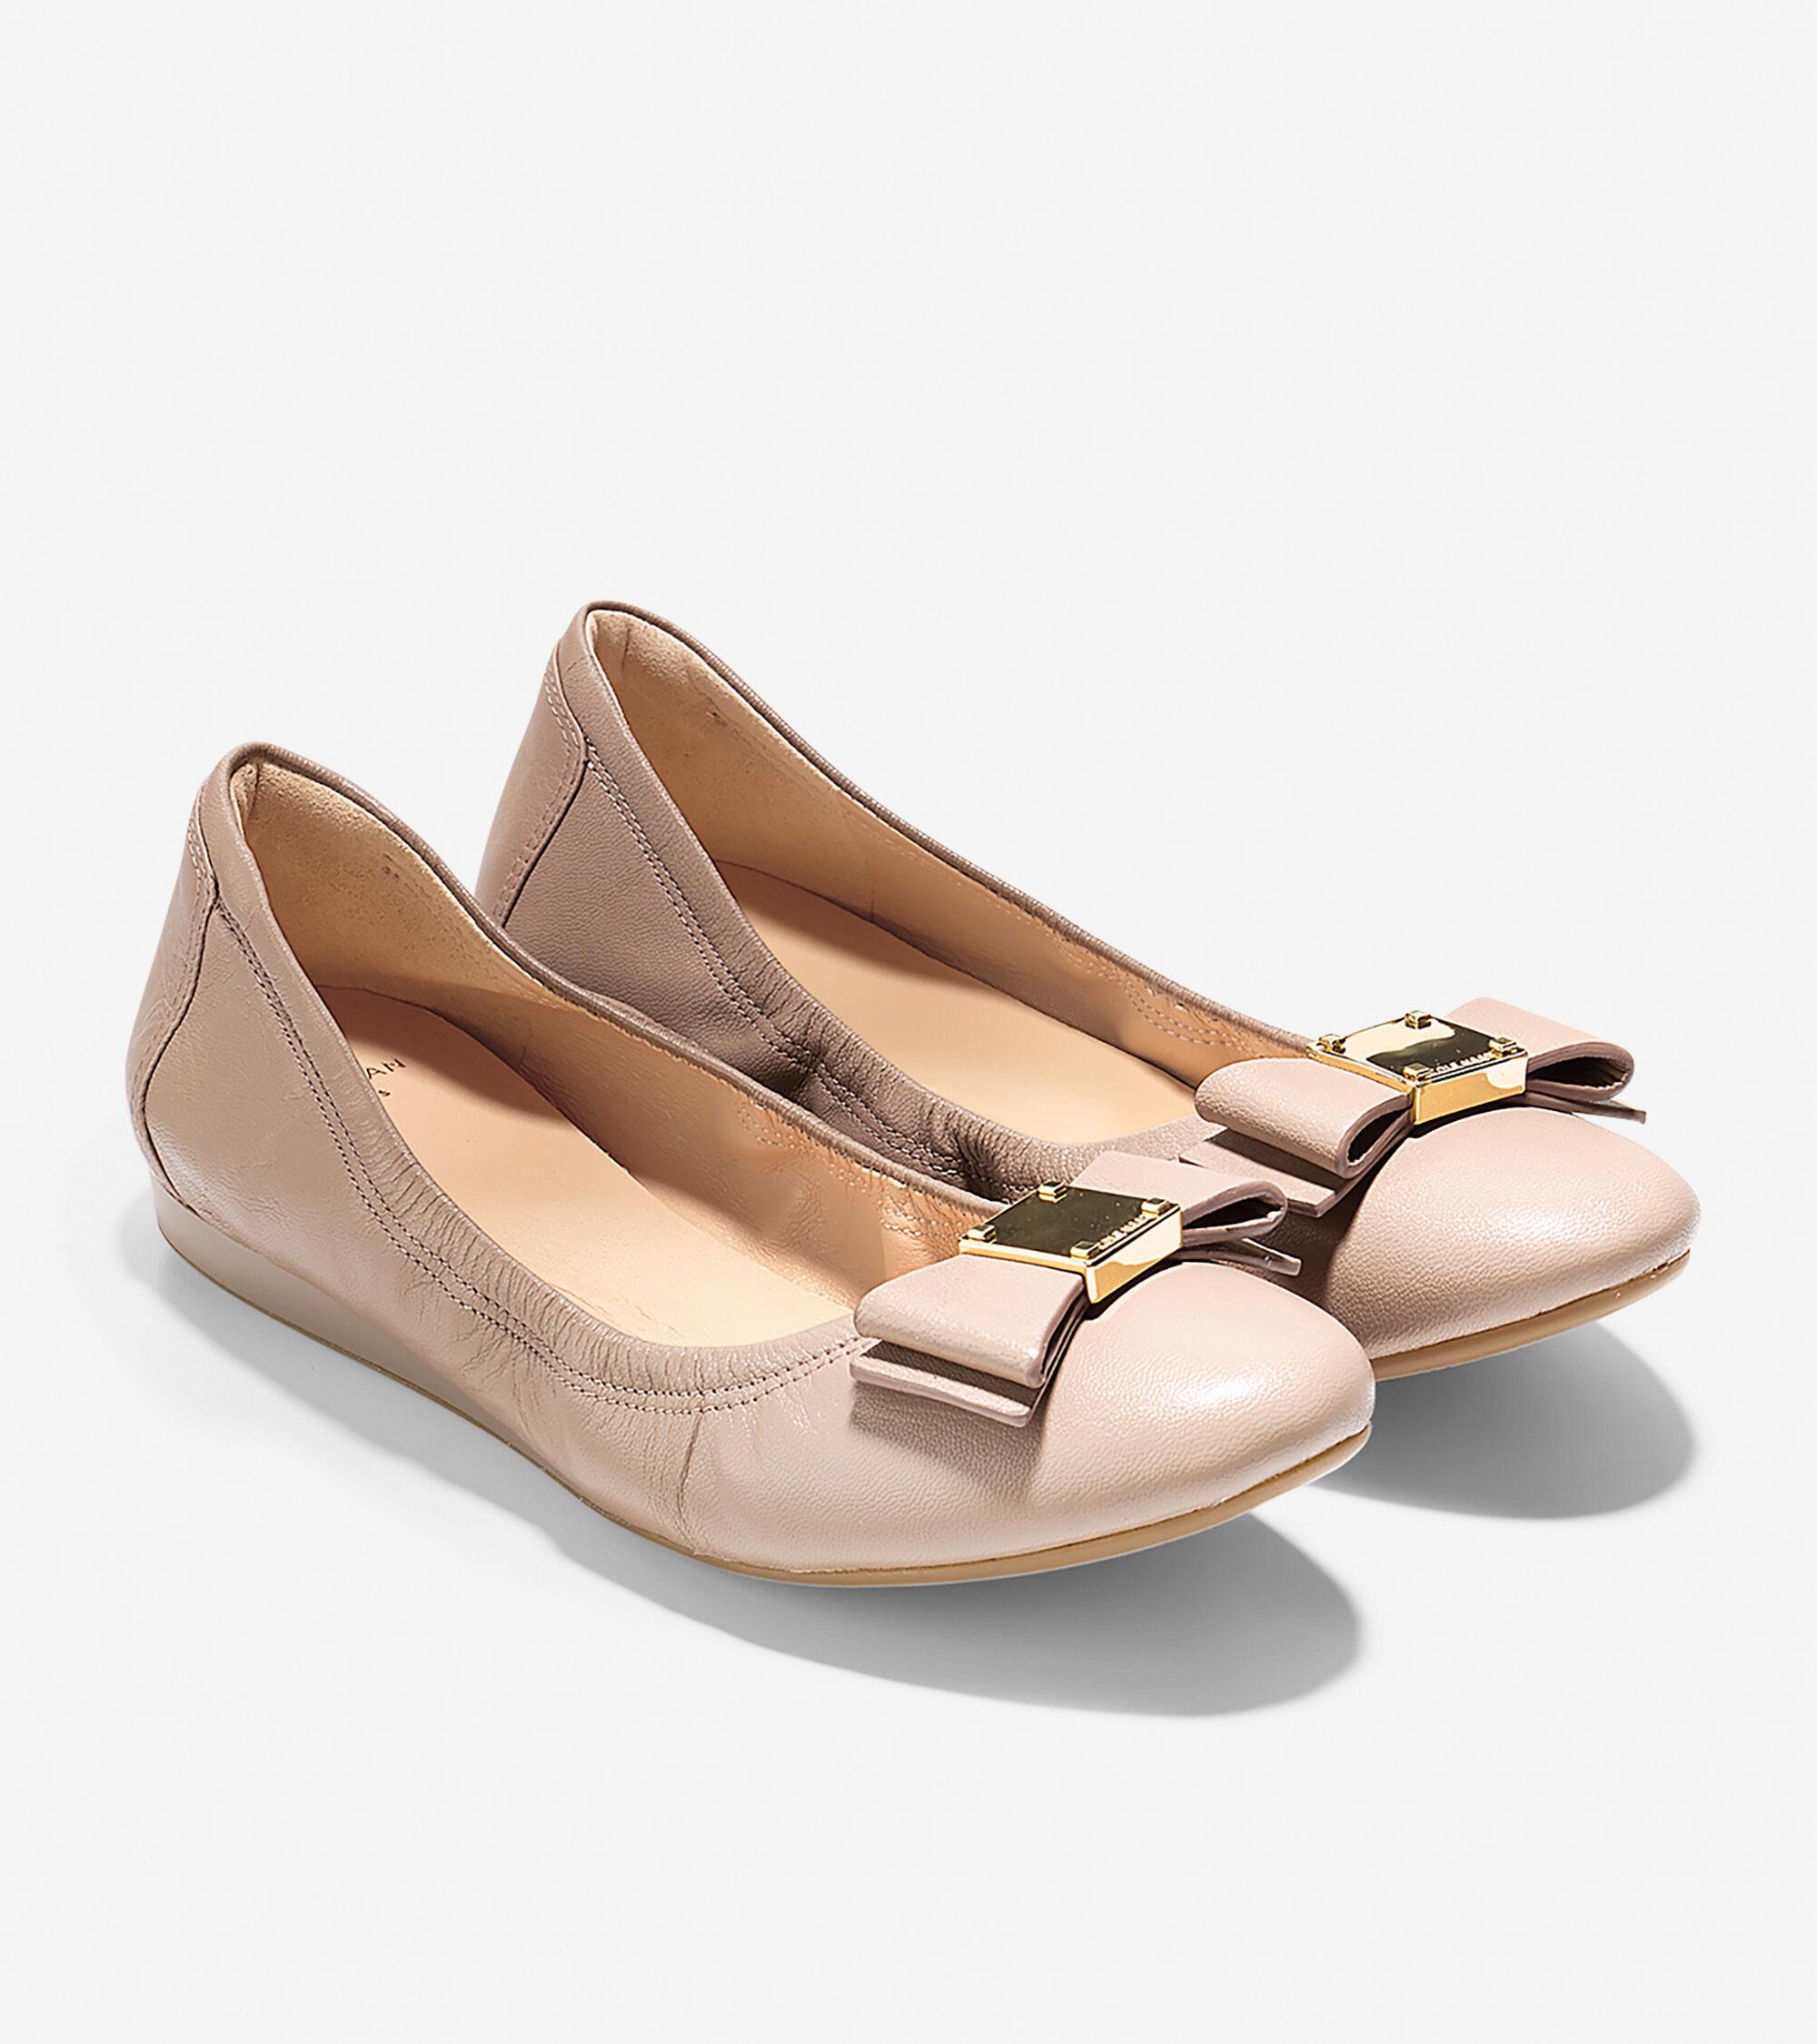 92f636941720 Women s Tali Bow Ballet Flats in Maple Sugar